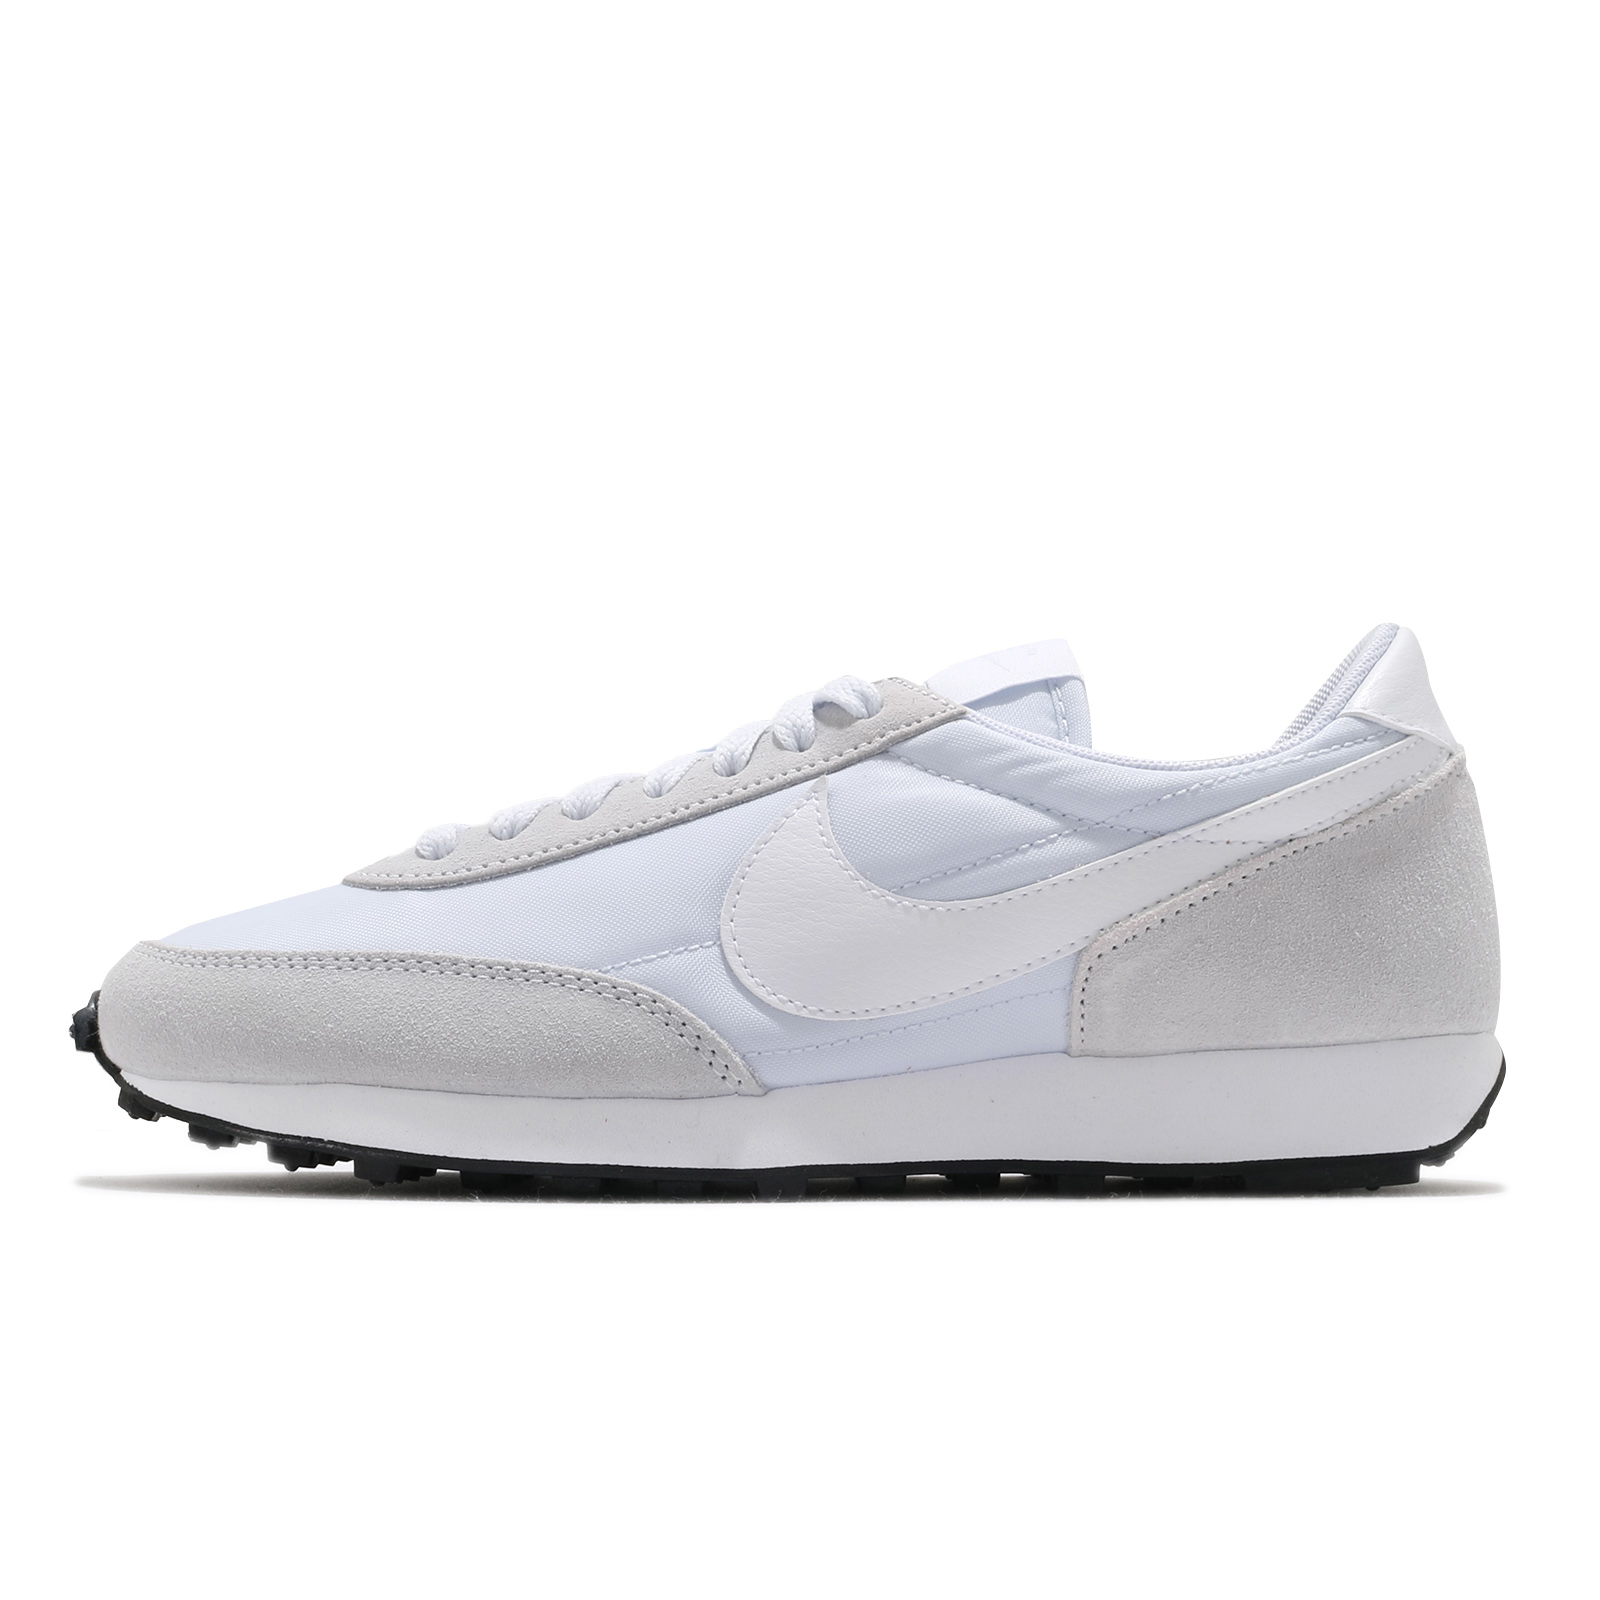 Nike 休閒鞋 Wmns DBreak 紫 灰 白 復古 麂皮 女鞋 Daybreak【ACS】 CK2351-009